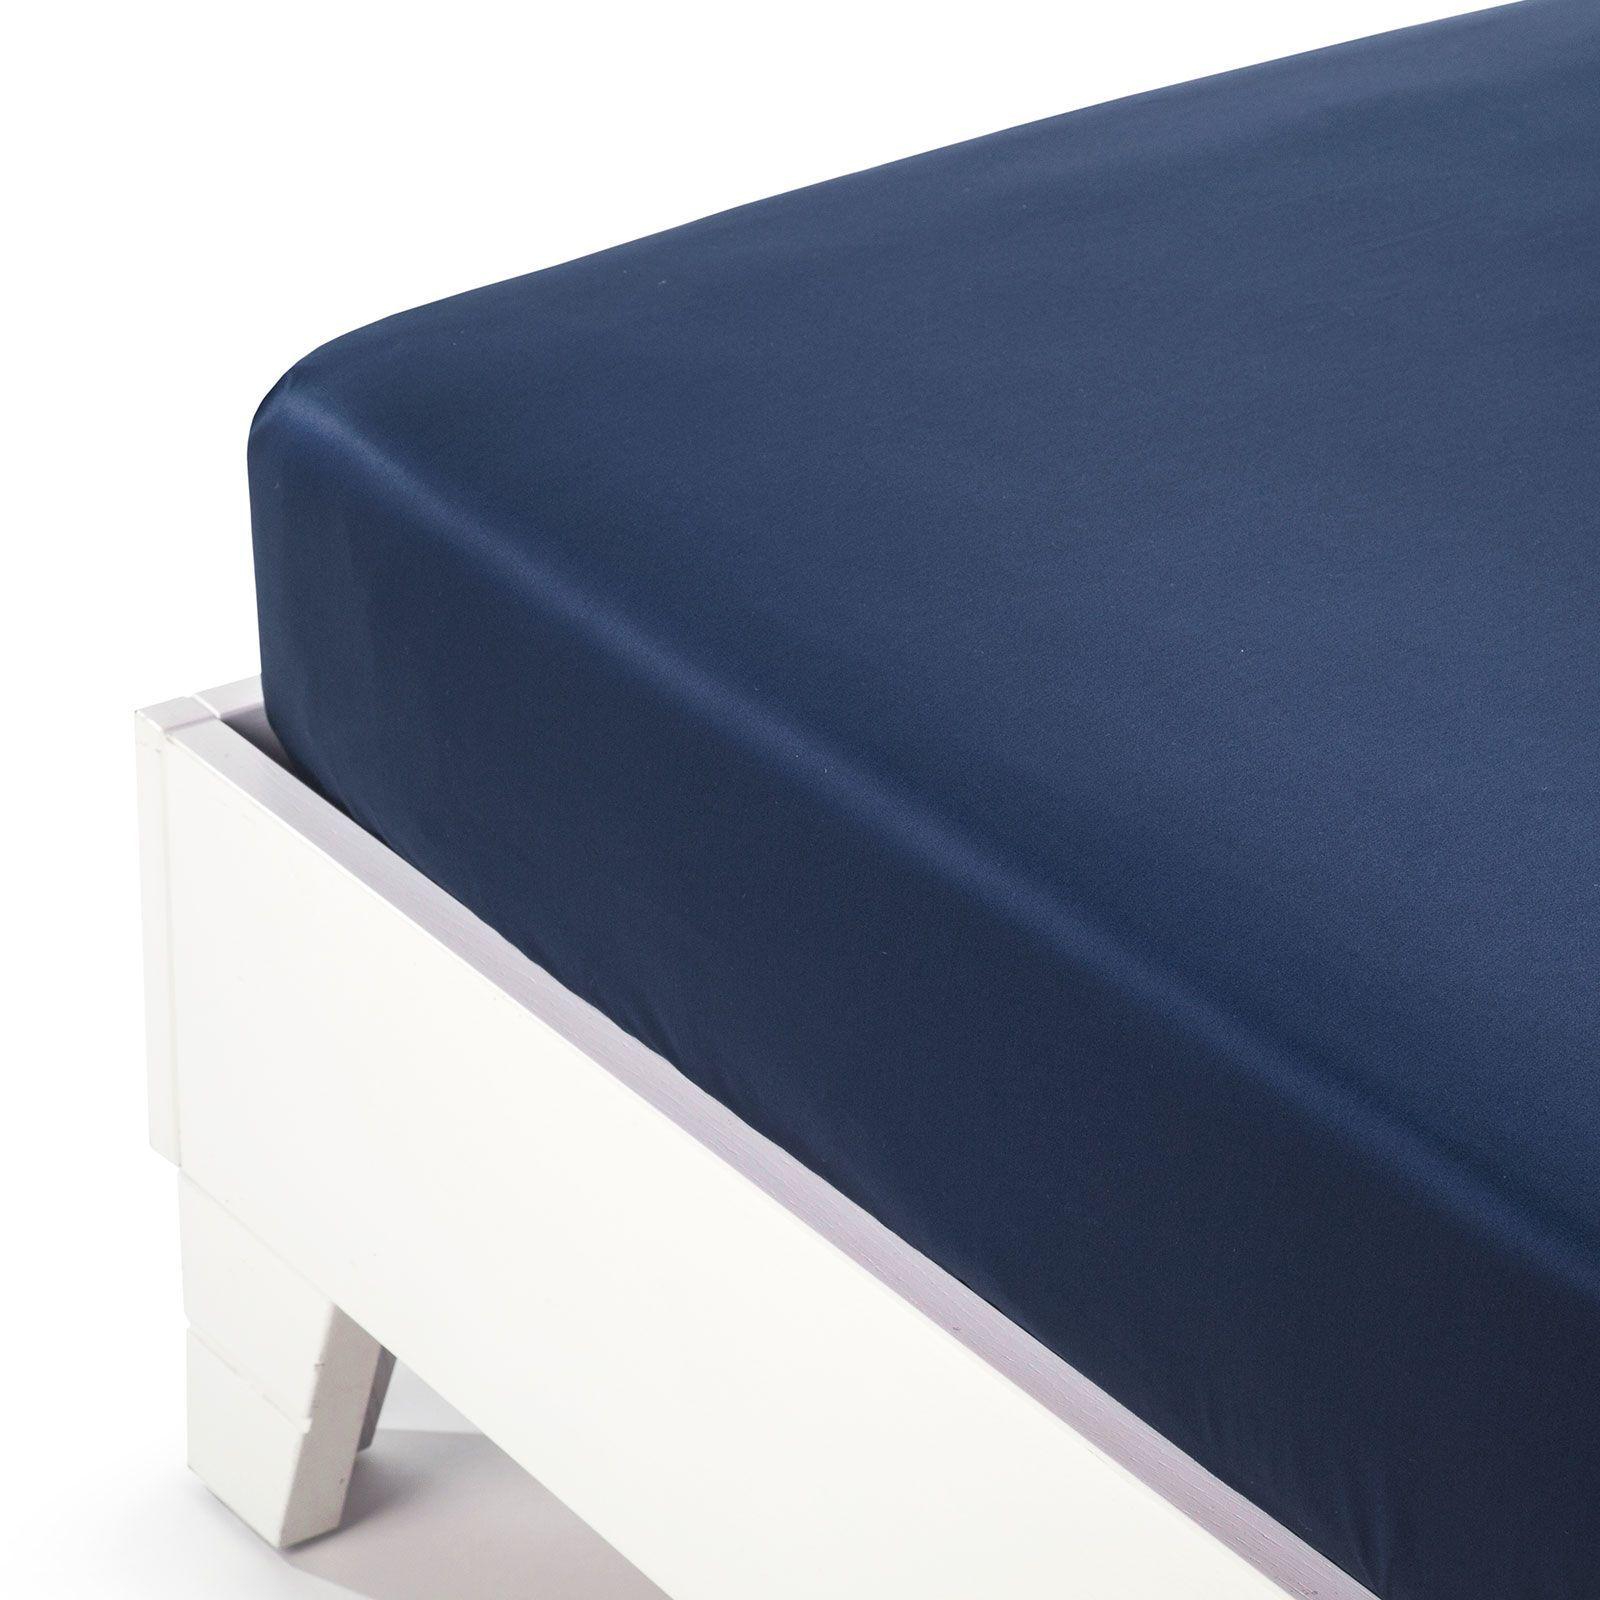 Простыни на резинке Простыня на резинке 160x200 Сaleffi Raso Tinta Unito с бордюром сатин темно-синяя prostynya-na-rezinke-90x200-saleffi-raso-tinta-unito-satin-blu-italiya.jpg